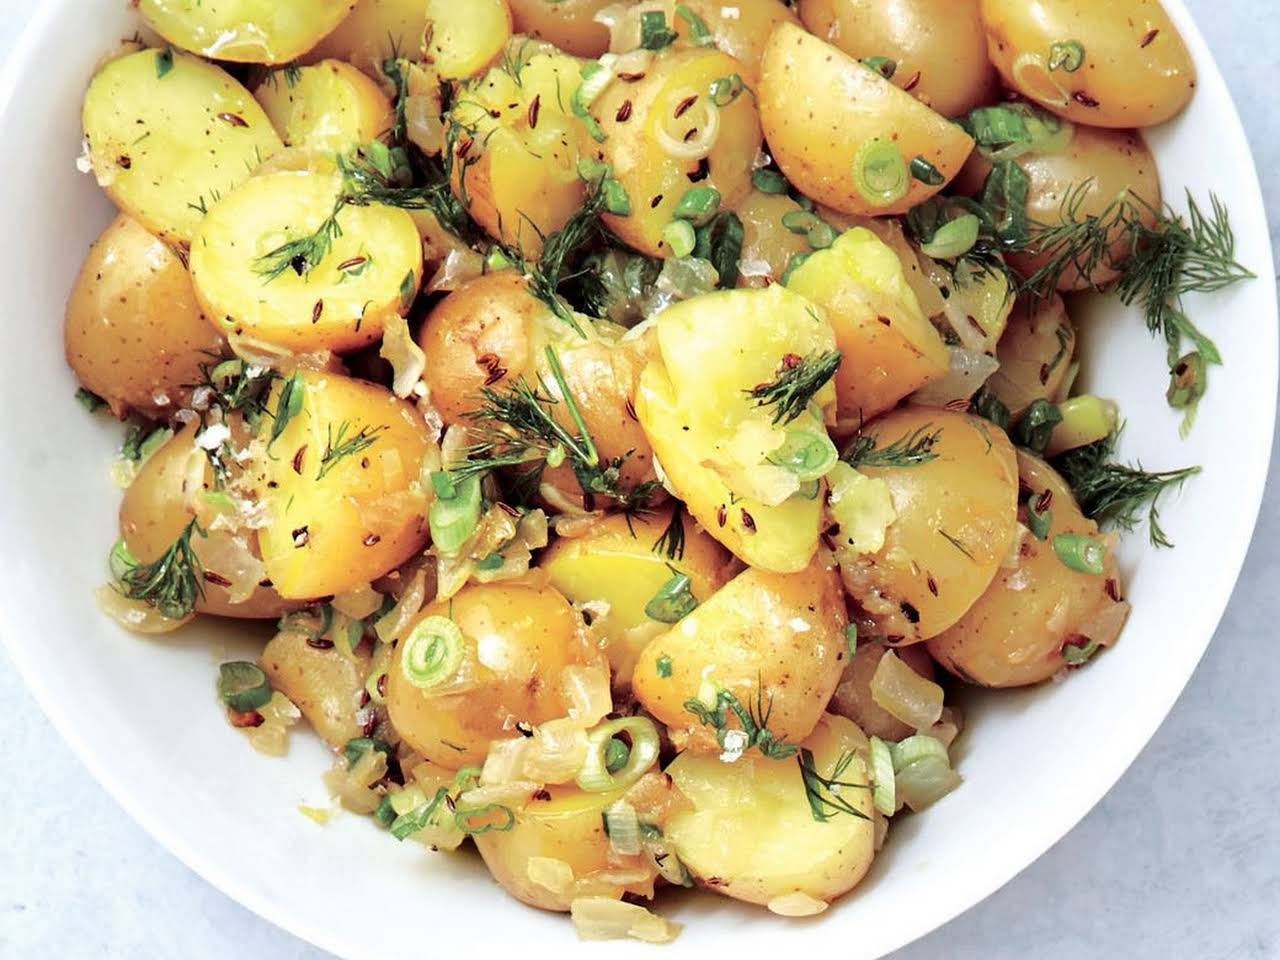 German Potato Salad Recipes Without Bacon